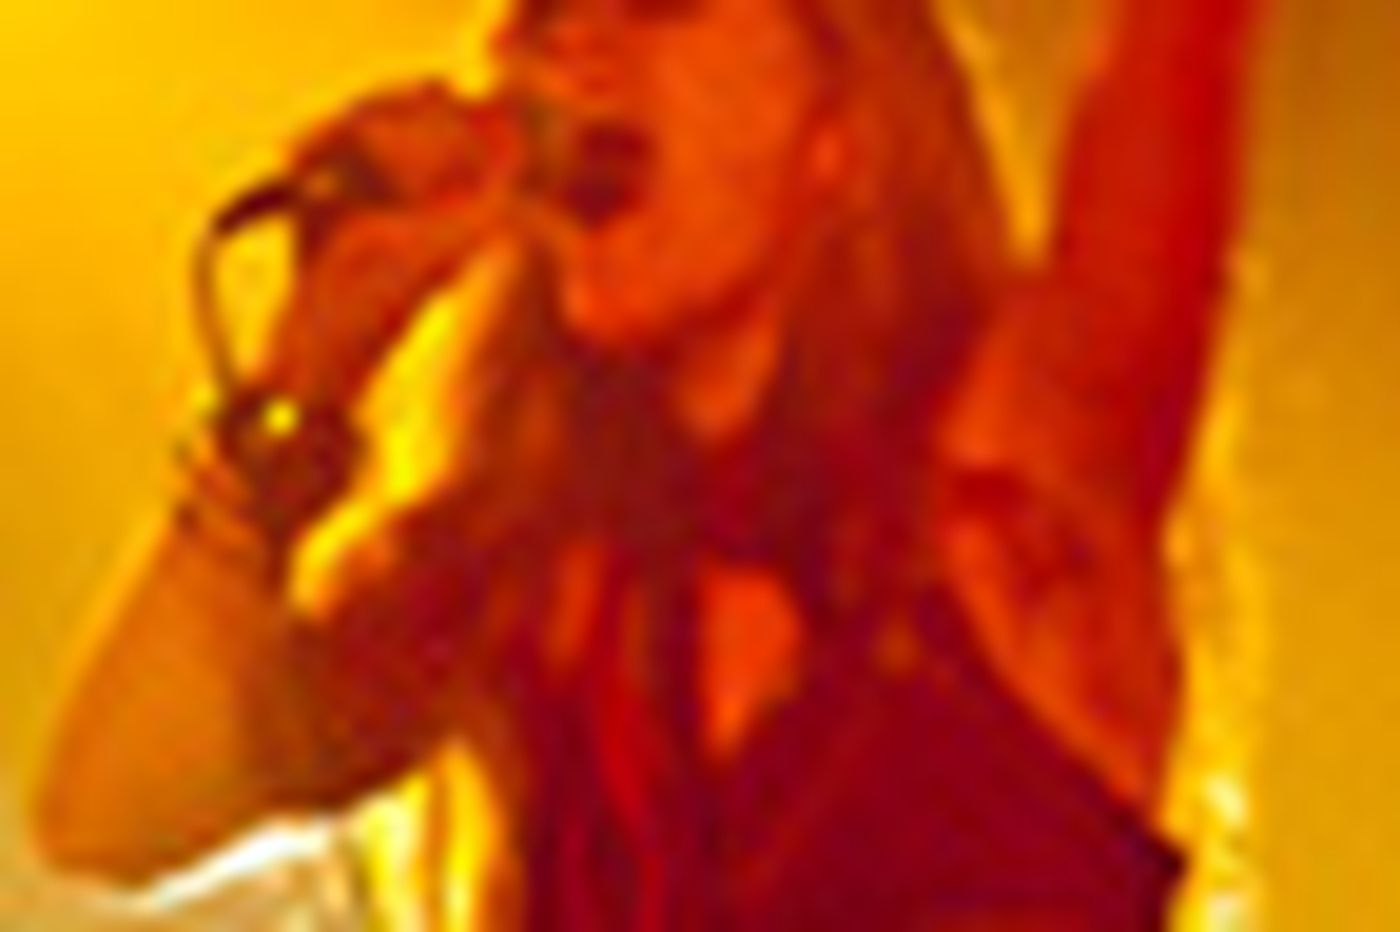 Death, purgatory,and rock stars